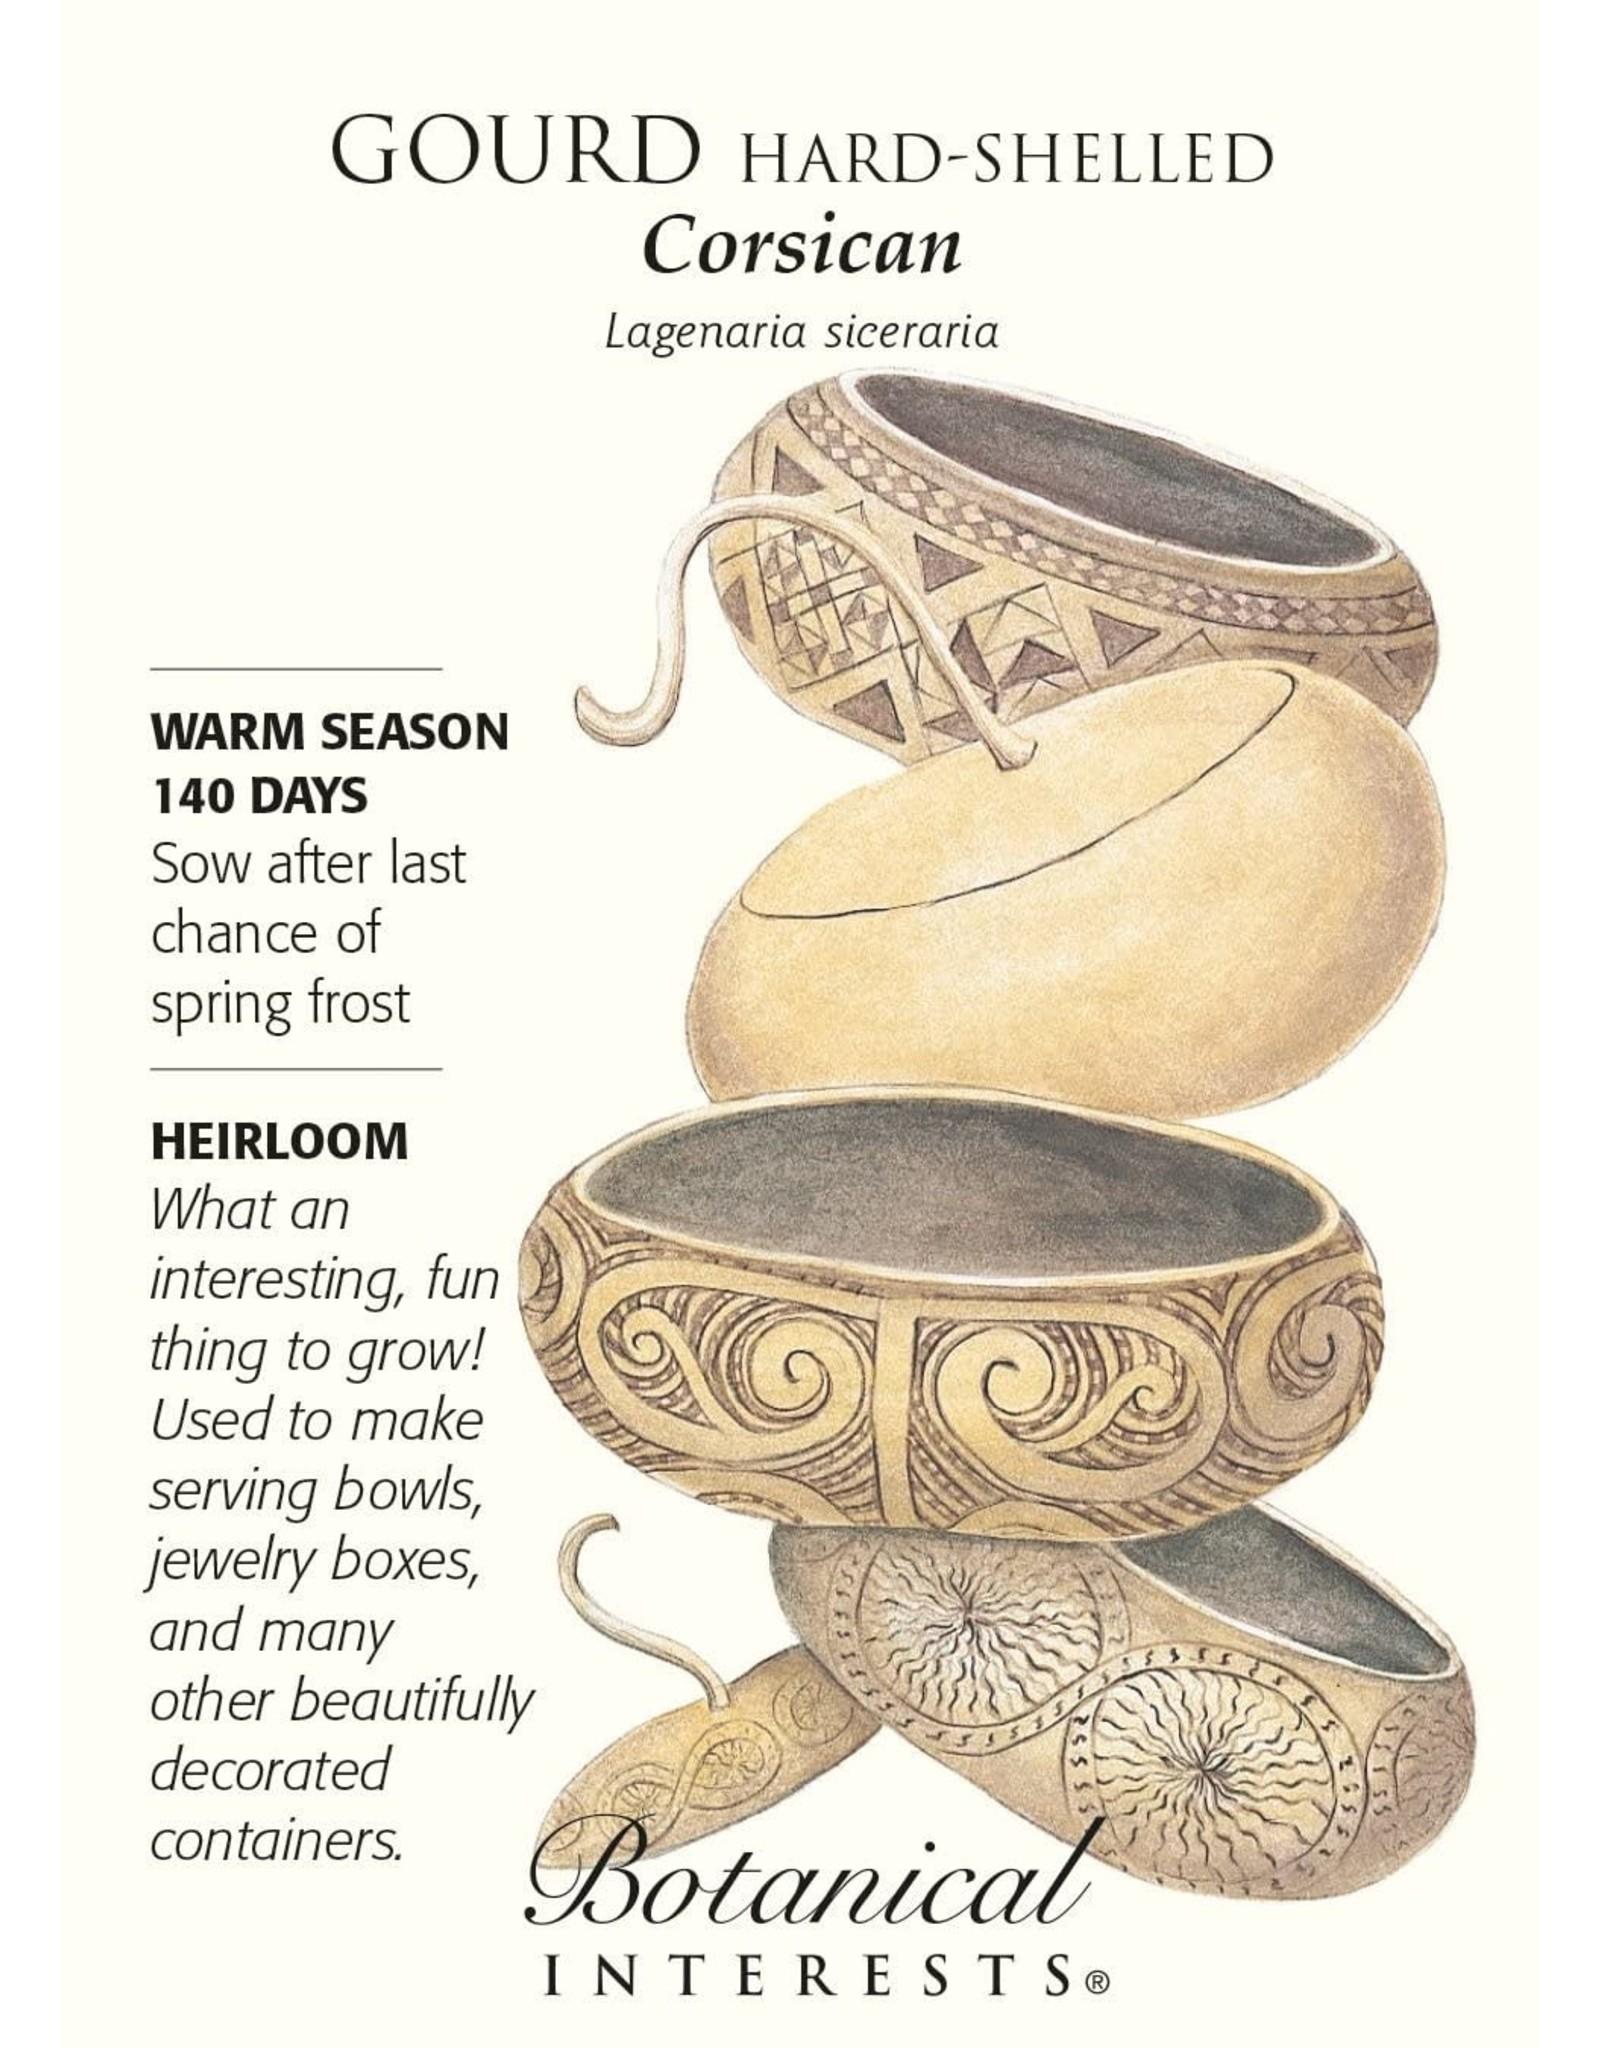 Seeds - Gourd Hard-Shelled Corsican